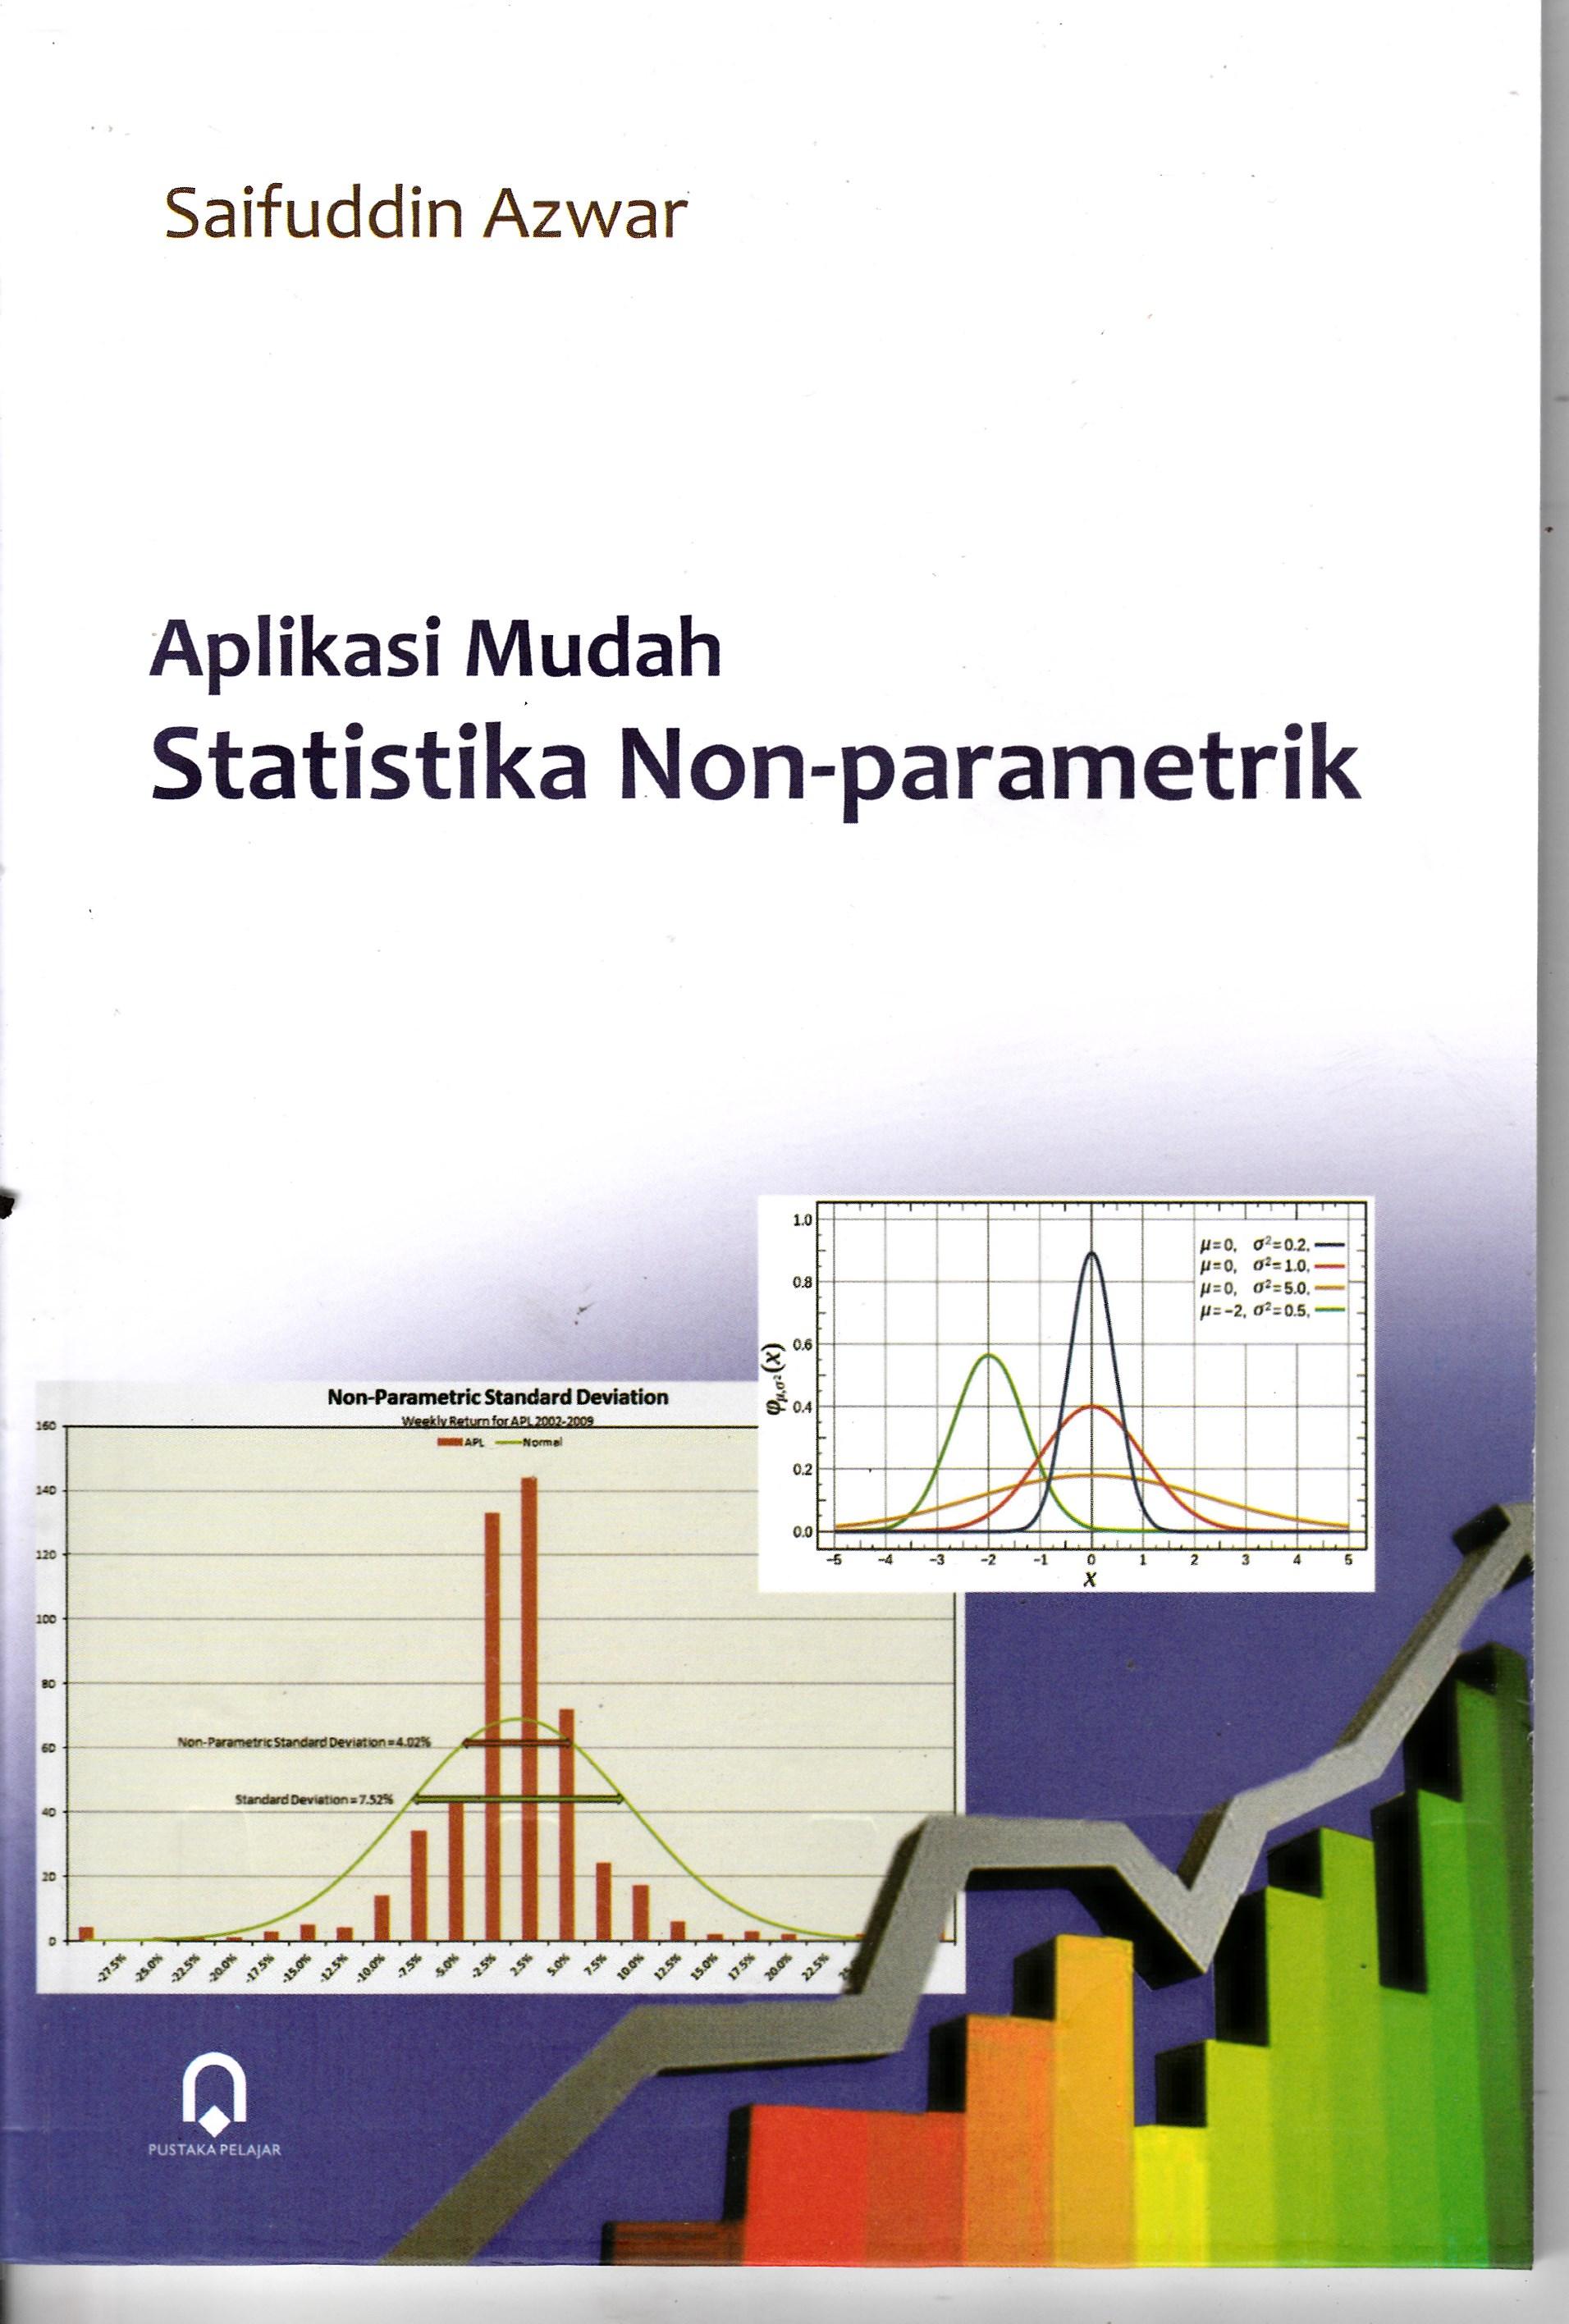 Aplikasi Mudah Statistika Non-parametrik